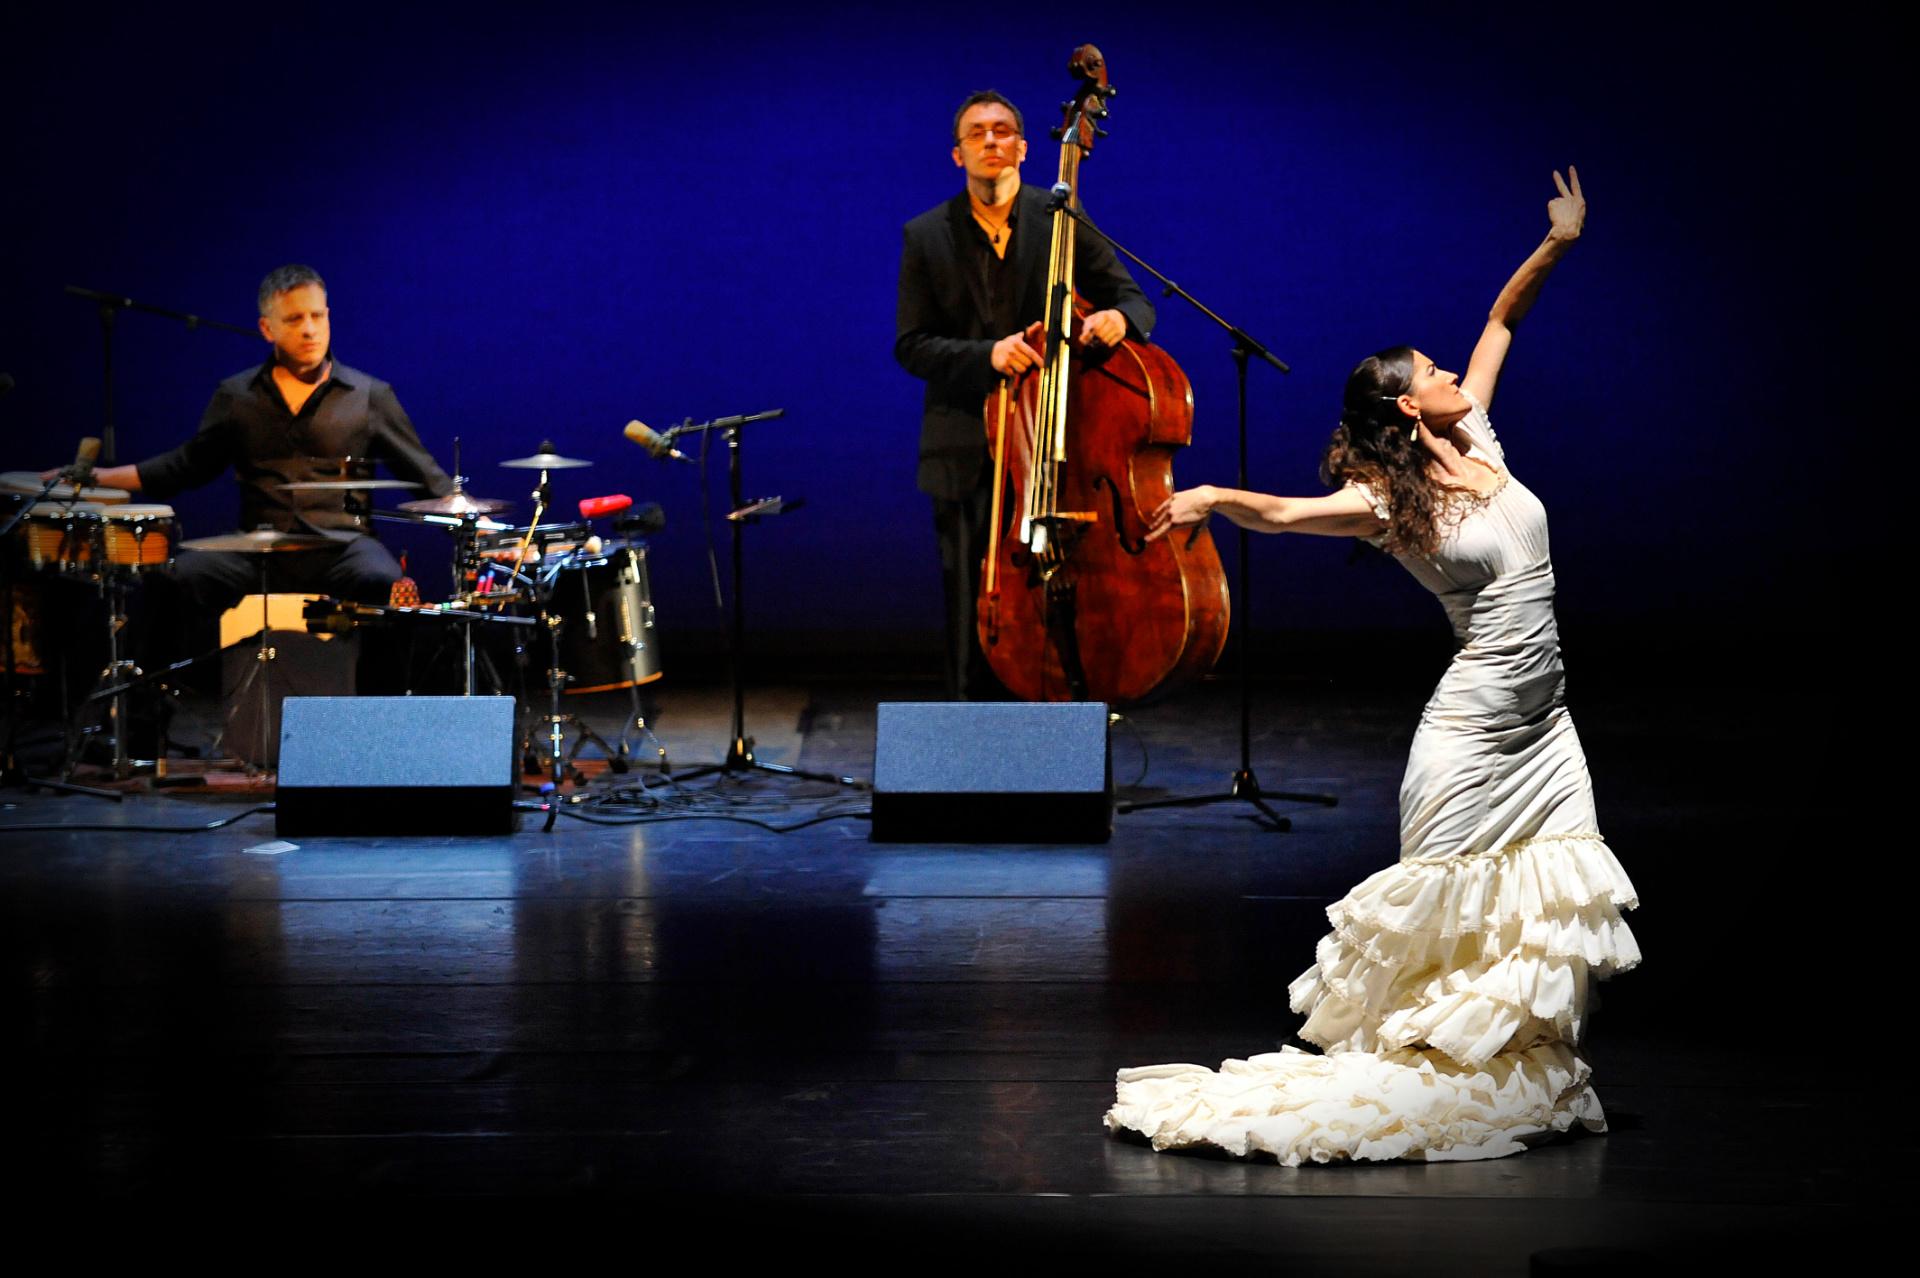 Sybille Märklin und Ensemble madrugá flamenca